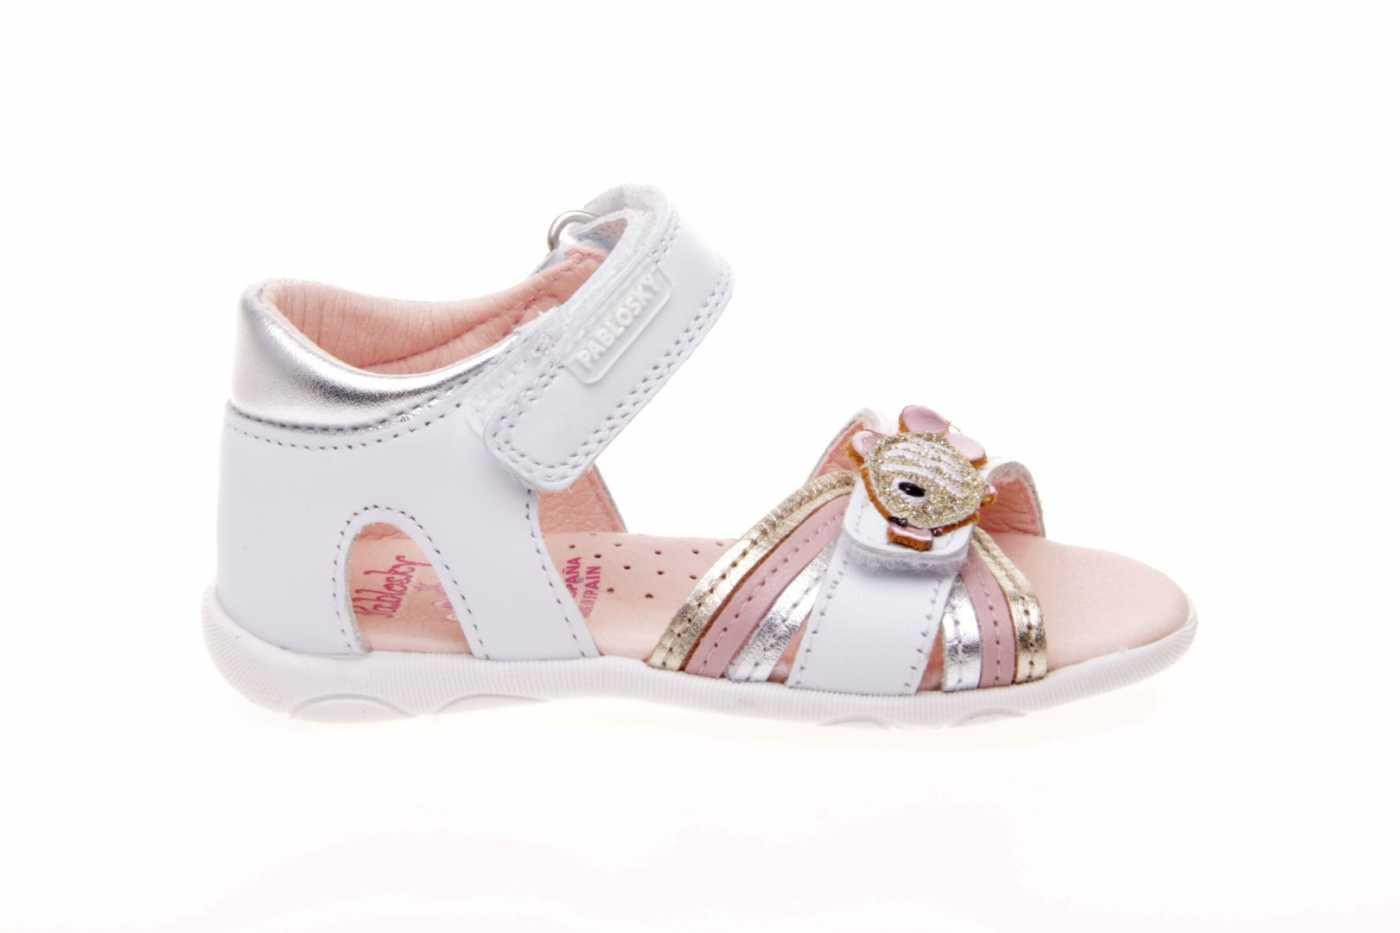 76550cdf6 Comprar zapato tipo PREANDANTE NIÑA estilo SANDALIA COLOR BLANCO ...